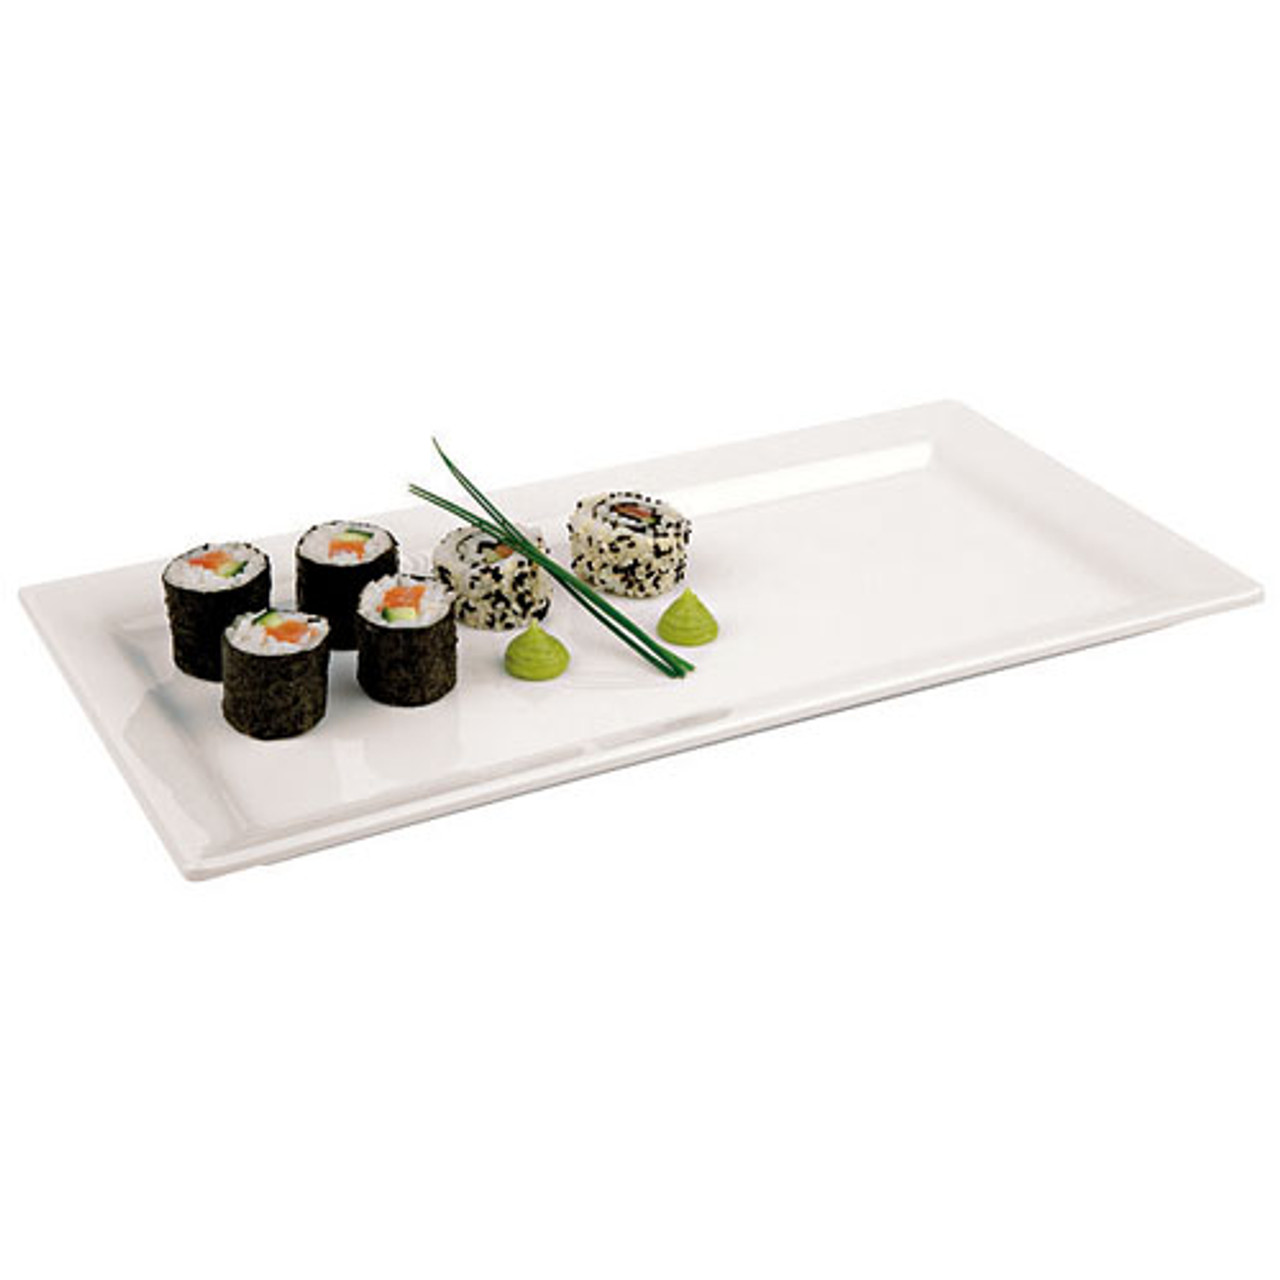 Rectangular White Melamine Sushi Tray - 14 x 7 1/8, L 14 x W 7.125 x H 0.5